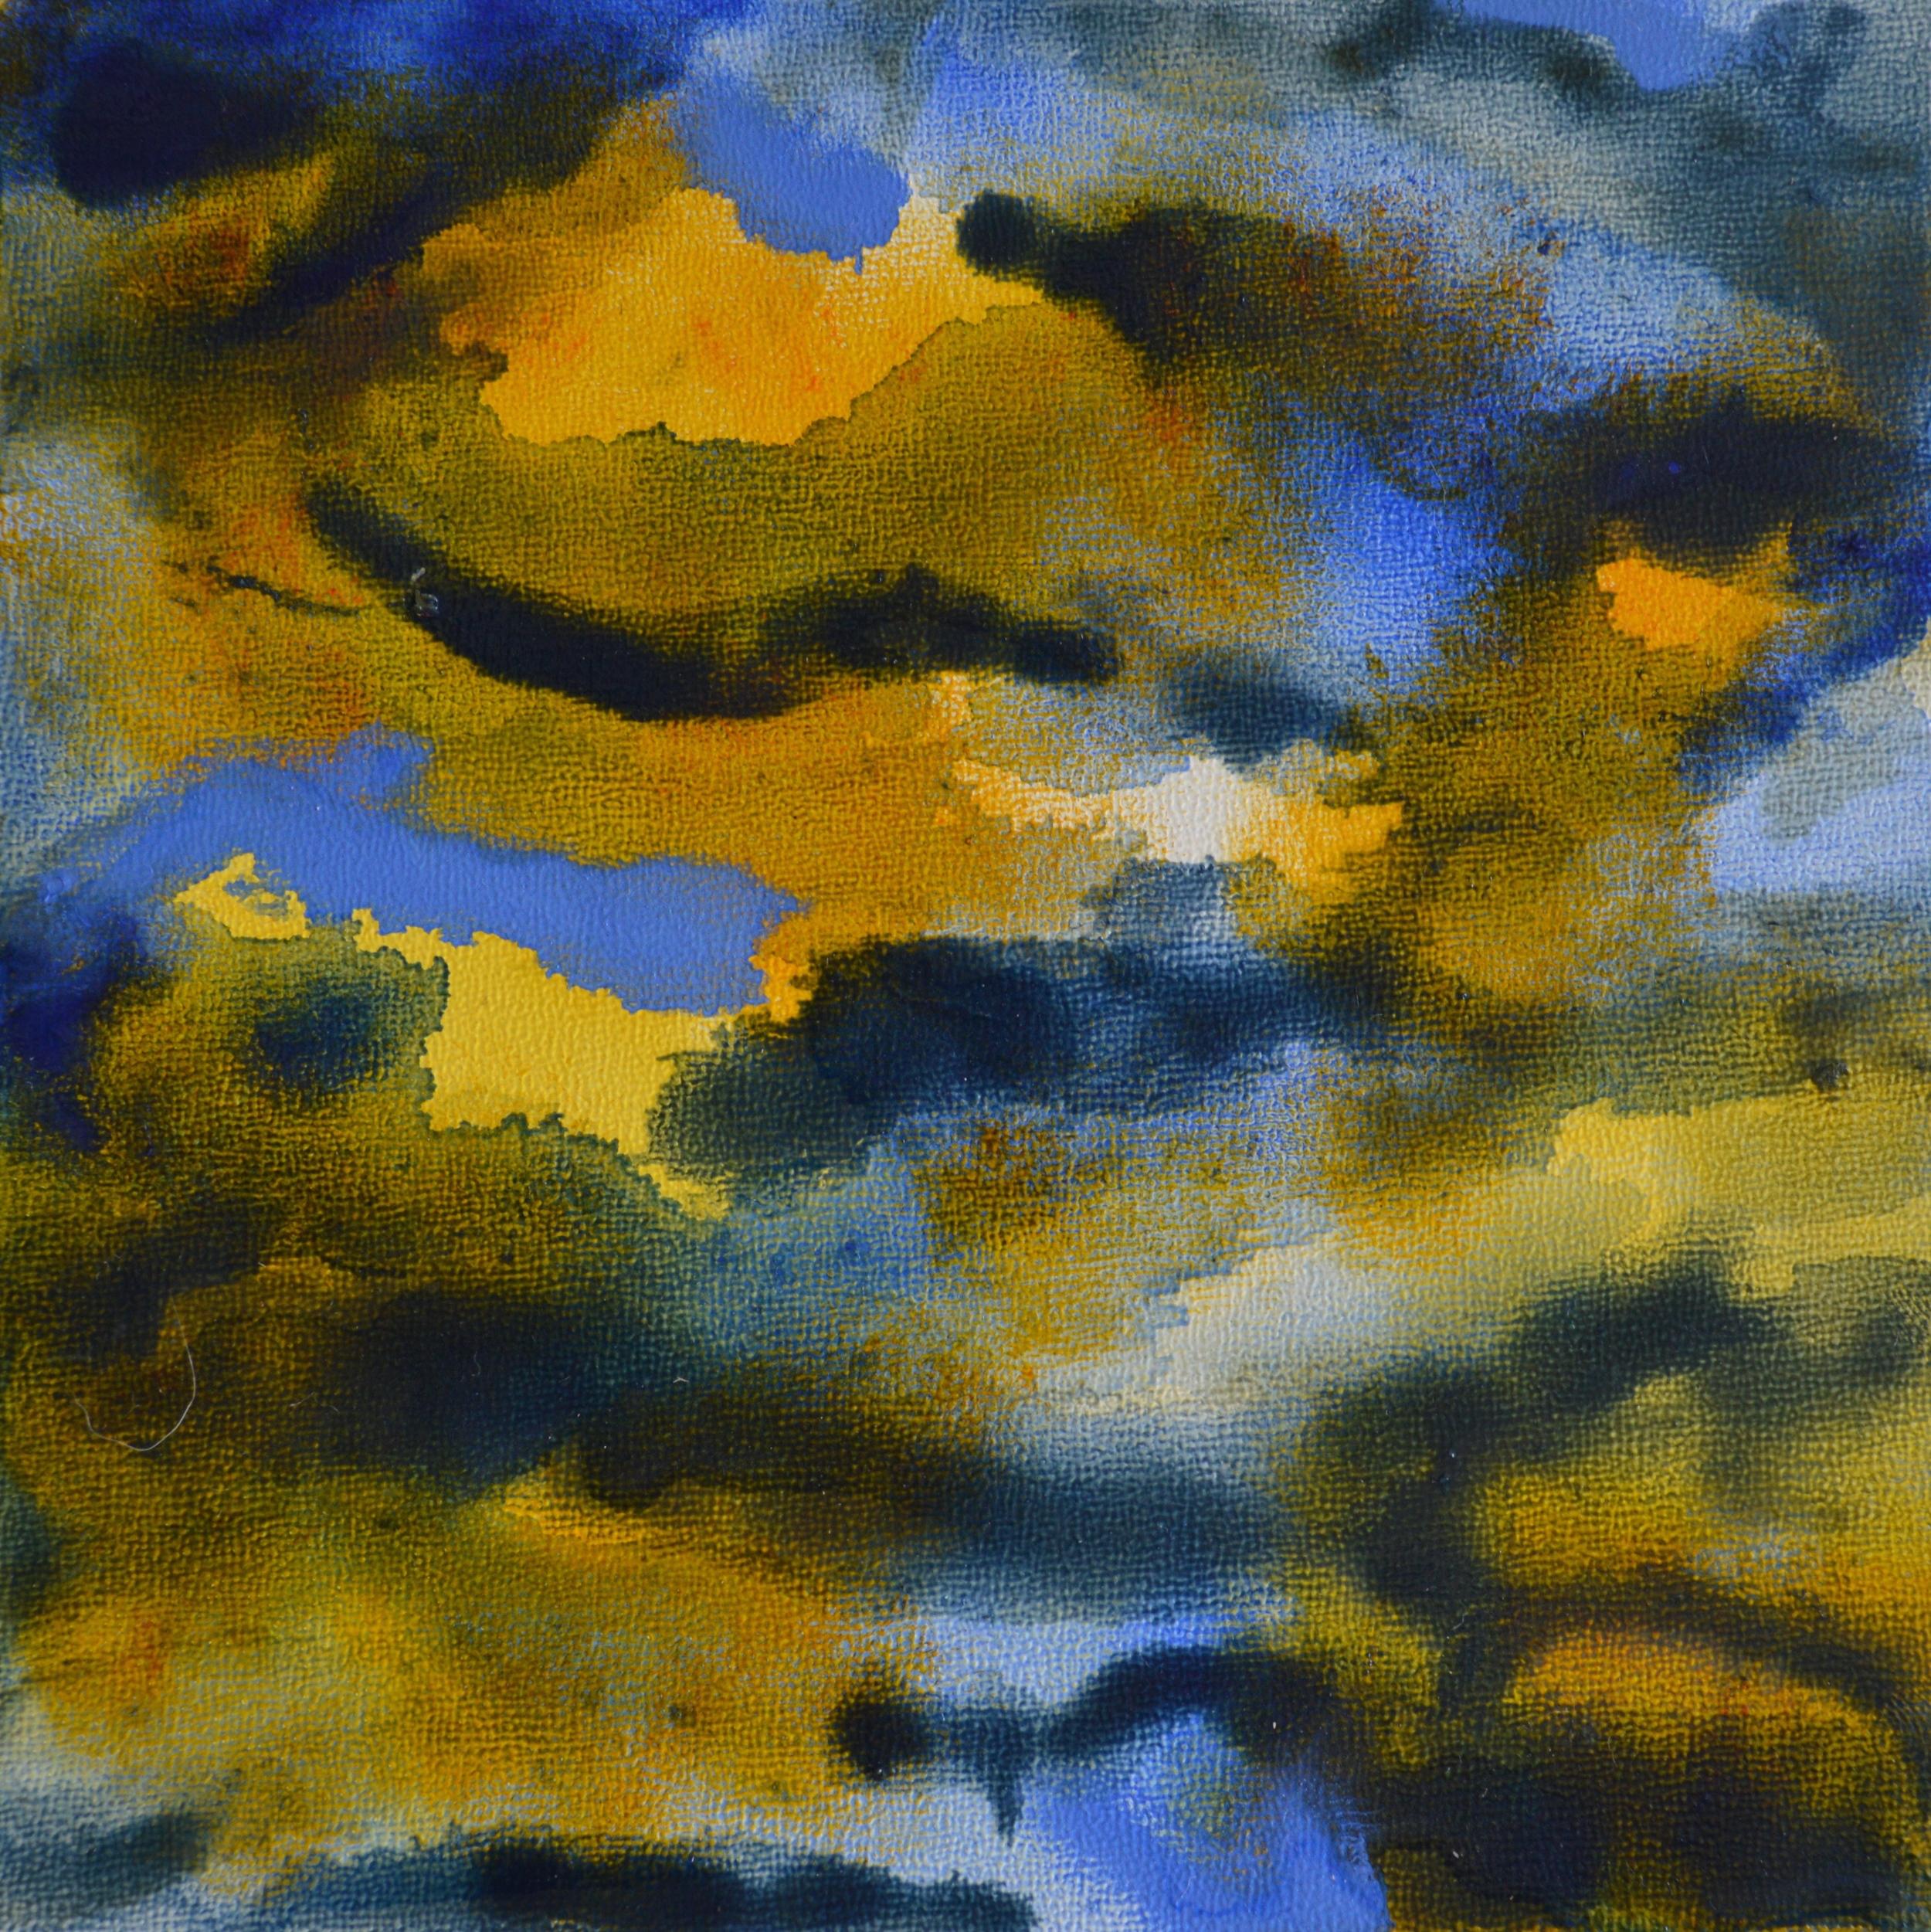 "Tessellating ,Oil on Panel, 6 x 6"", 2014"